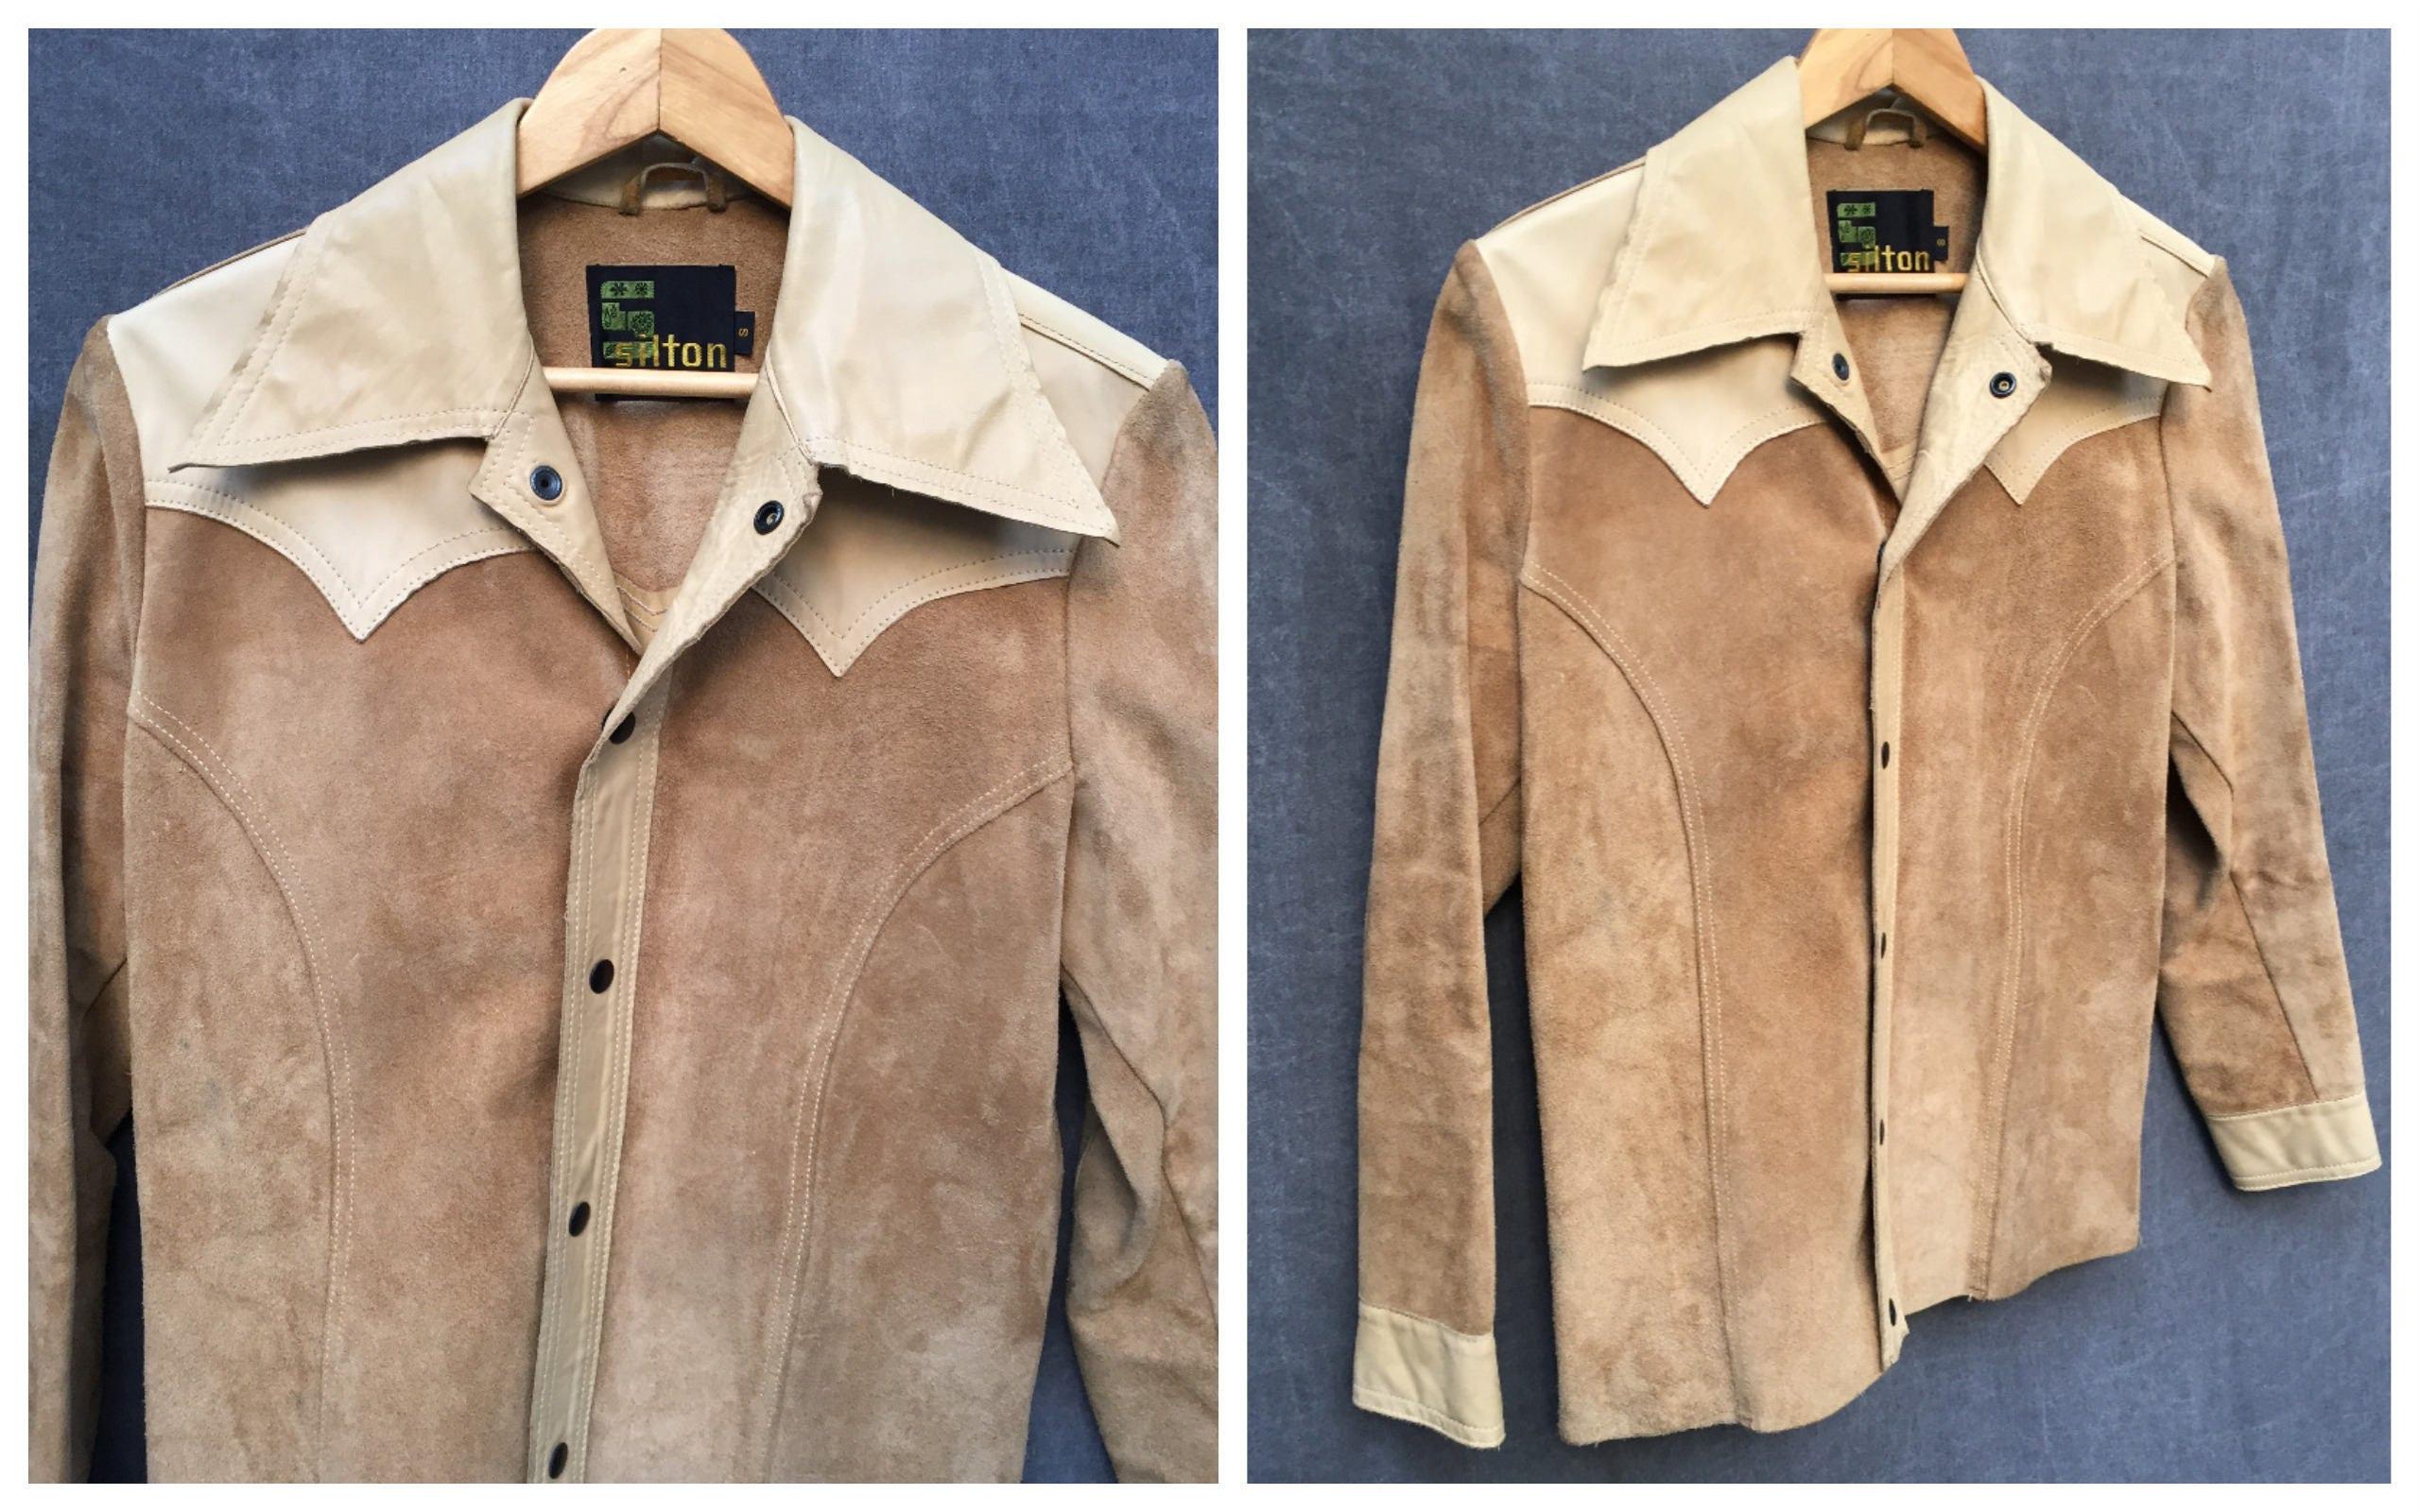 70's Silton Leather Jacket Camel Boho Gypsy Hobo Hippie - Men's 46 Size Large to XL Wn29IR